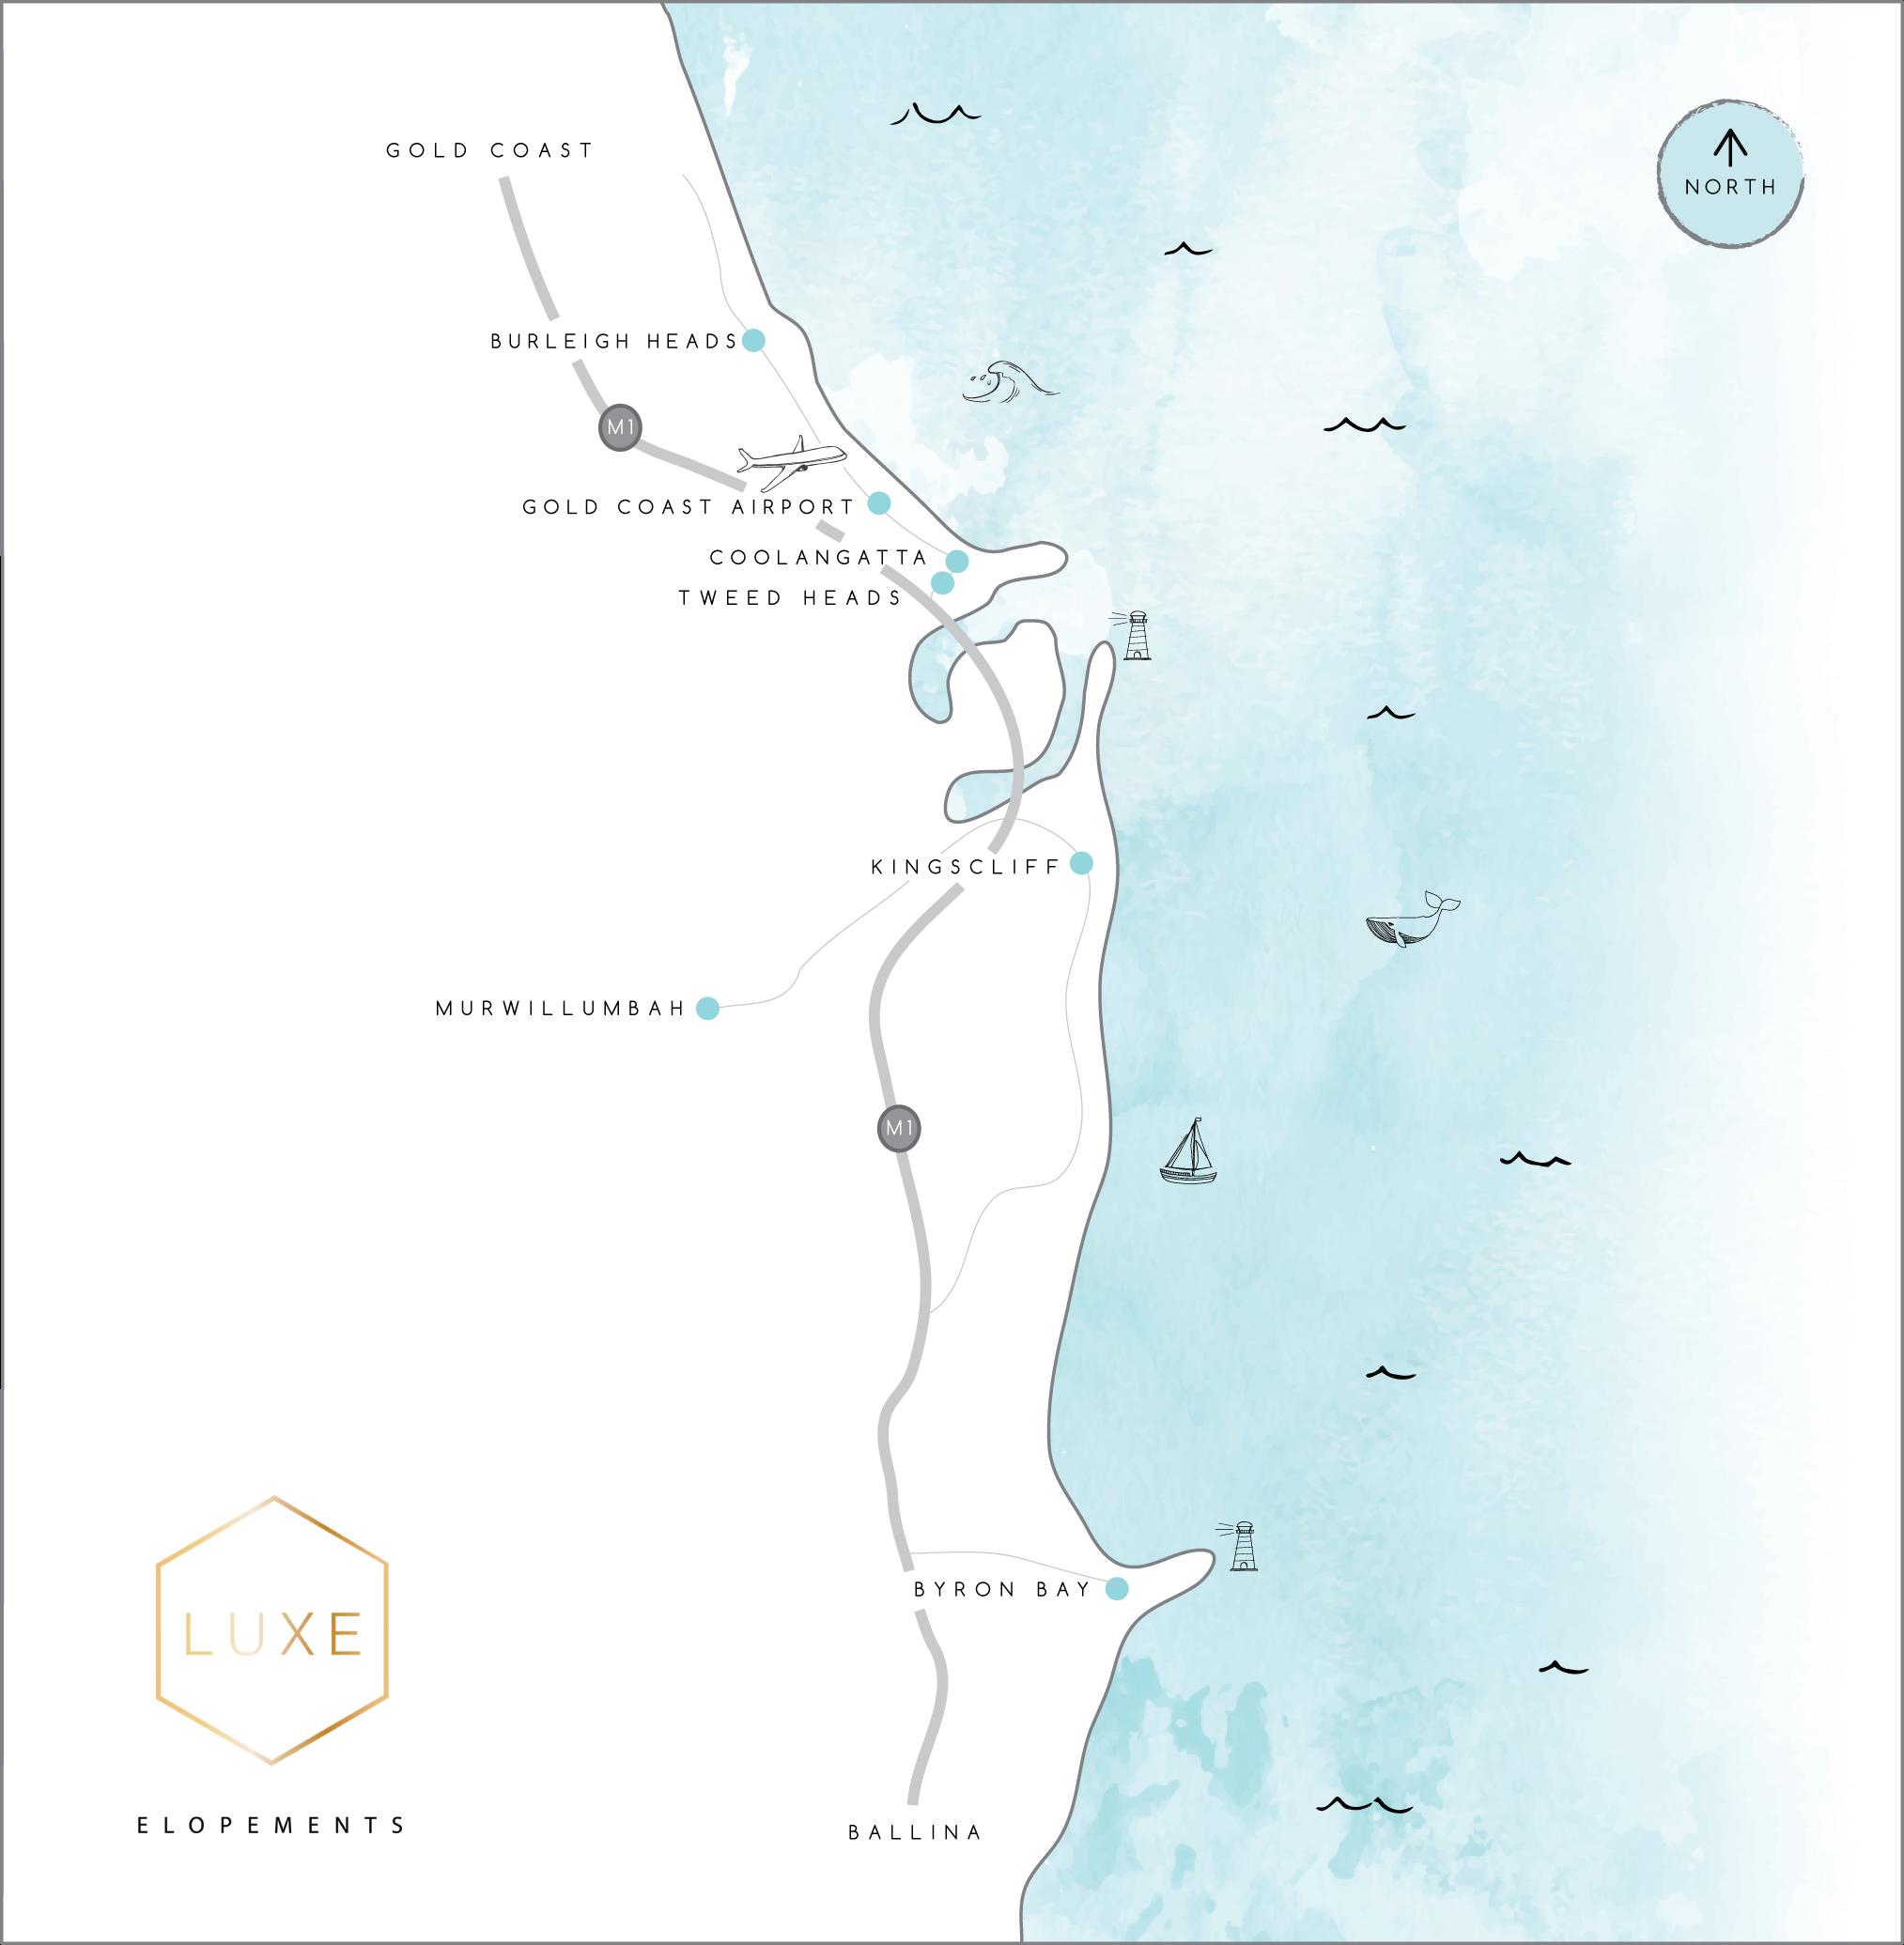 MAP_GOLDCOASTTOBYRON